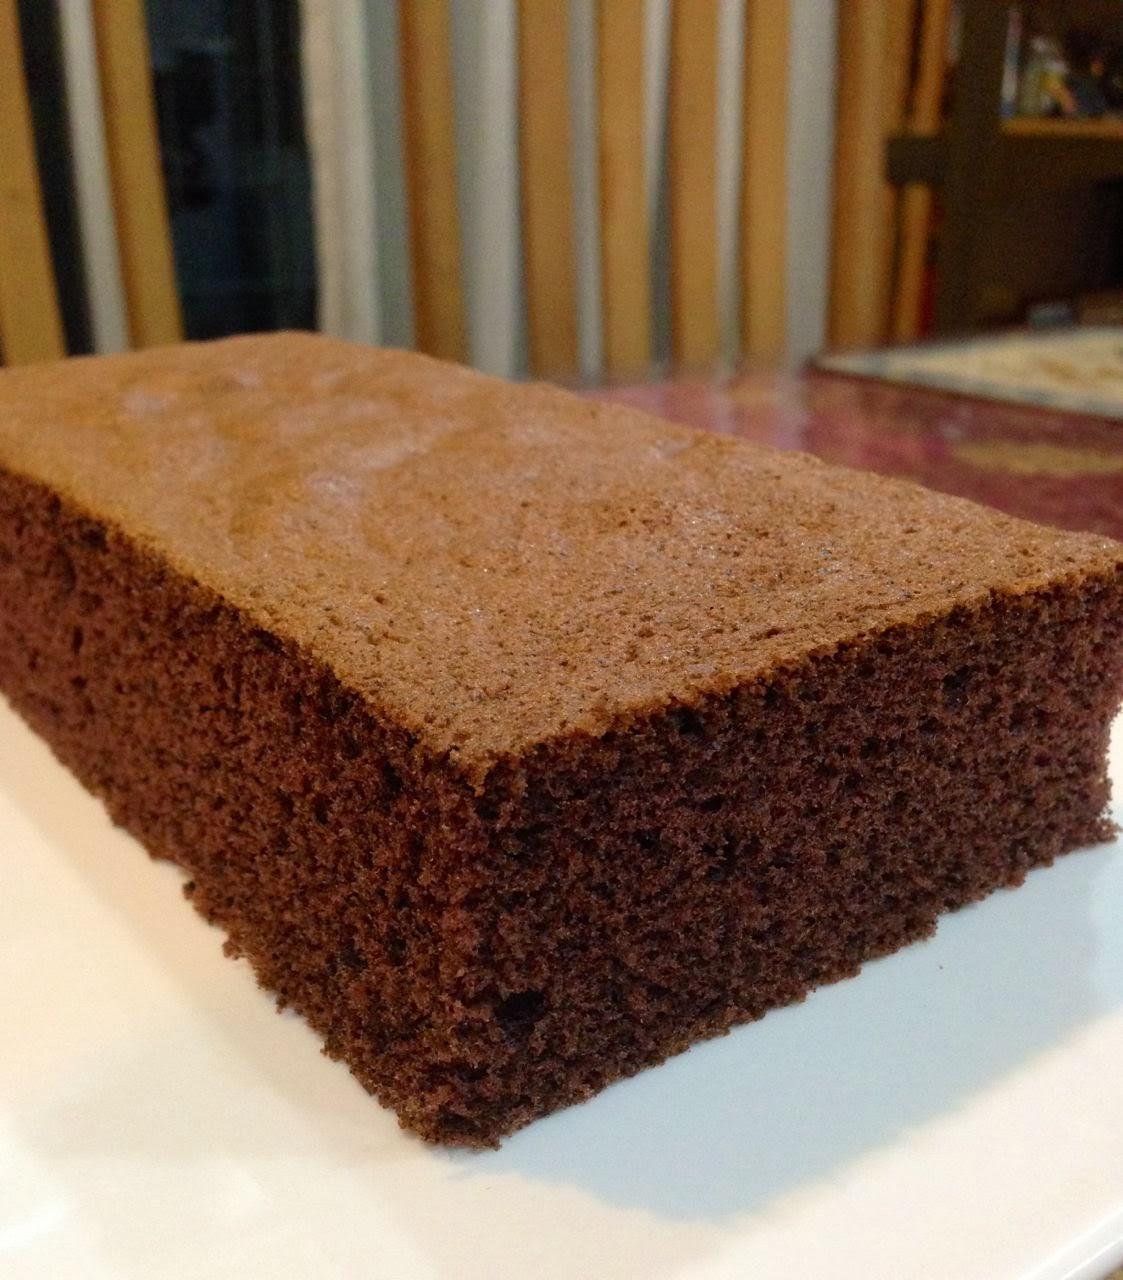 Baking diary chocolate sponge cake for Chocolate sponge ingredients